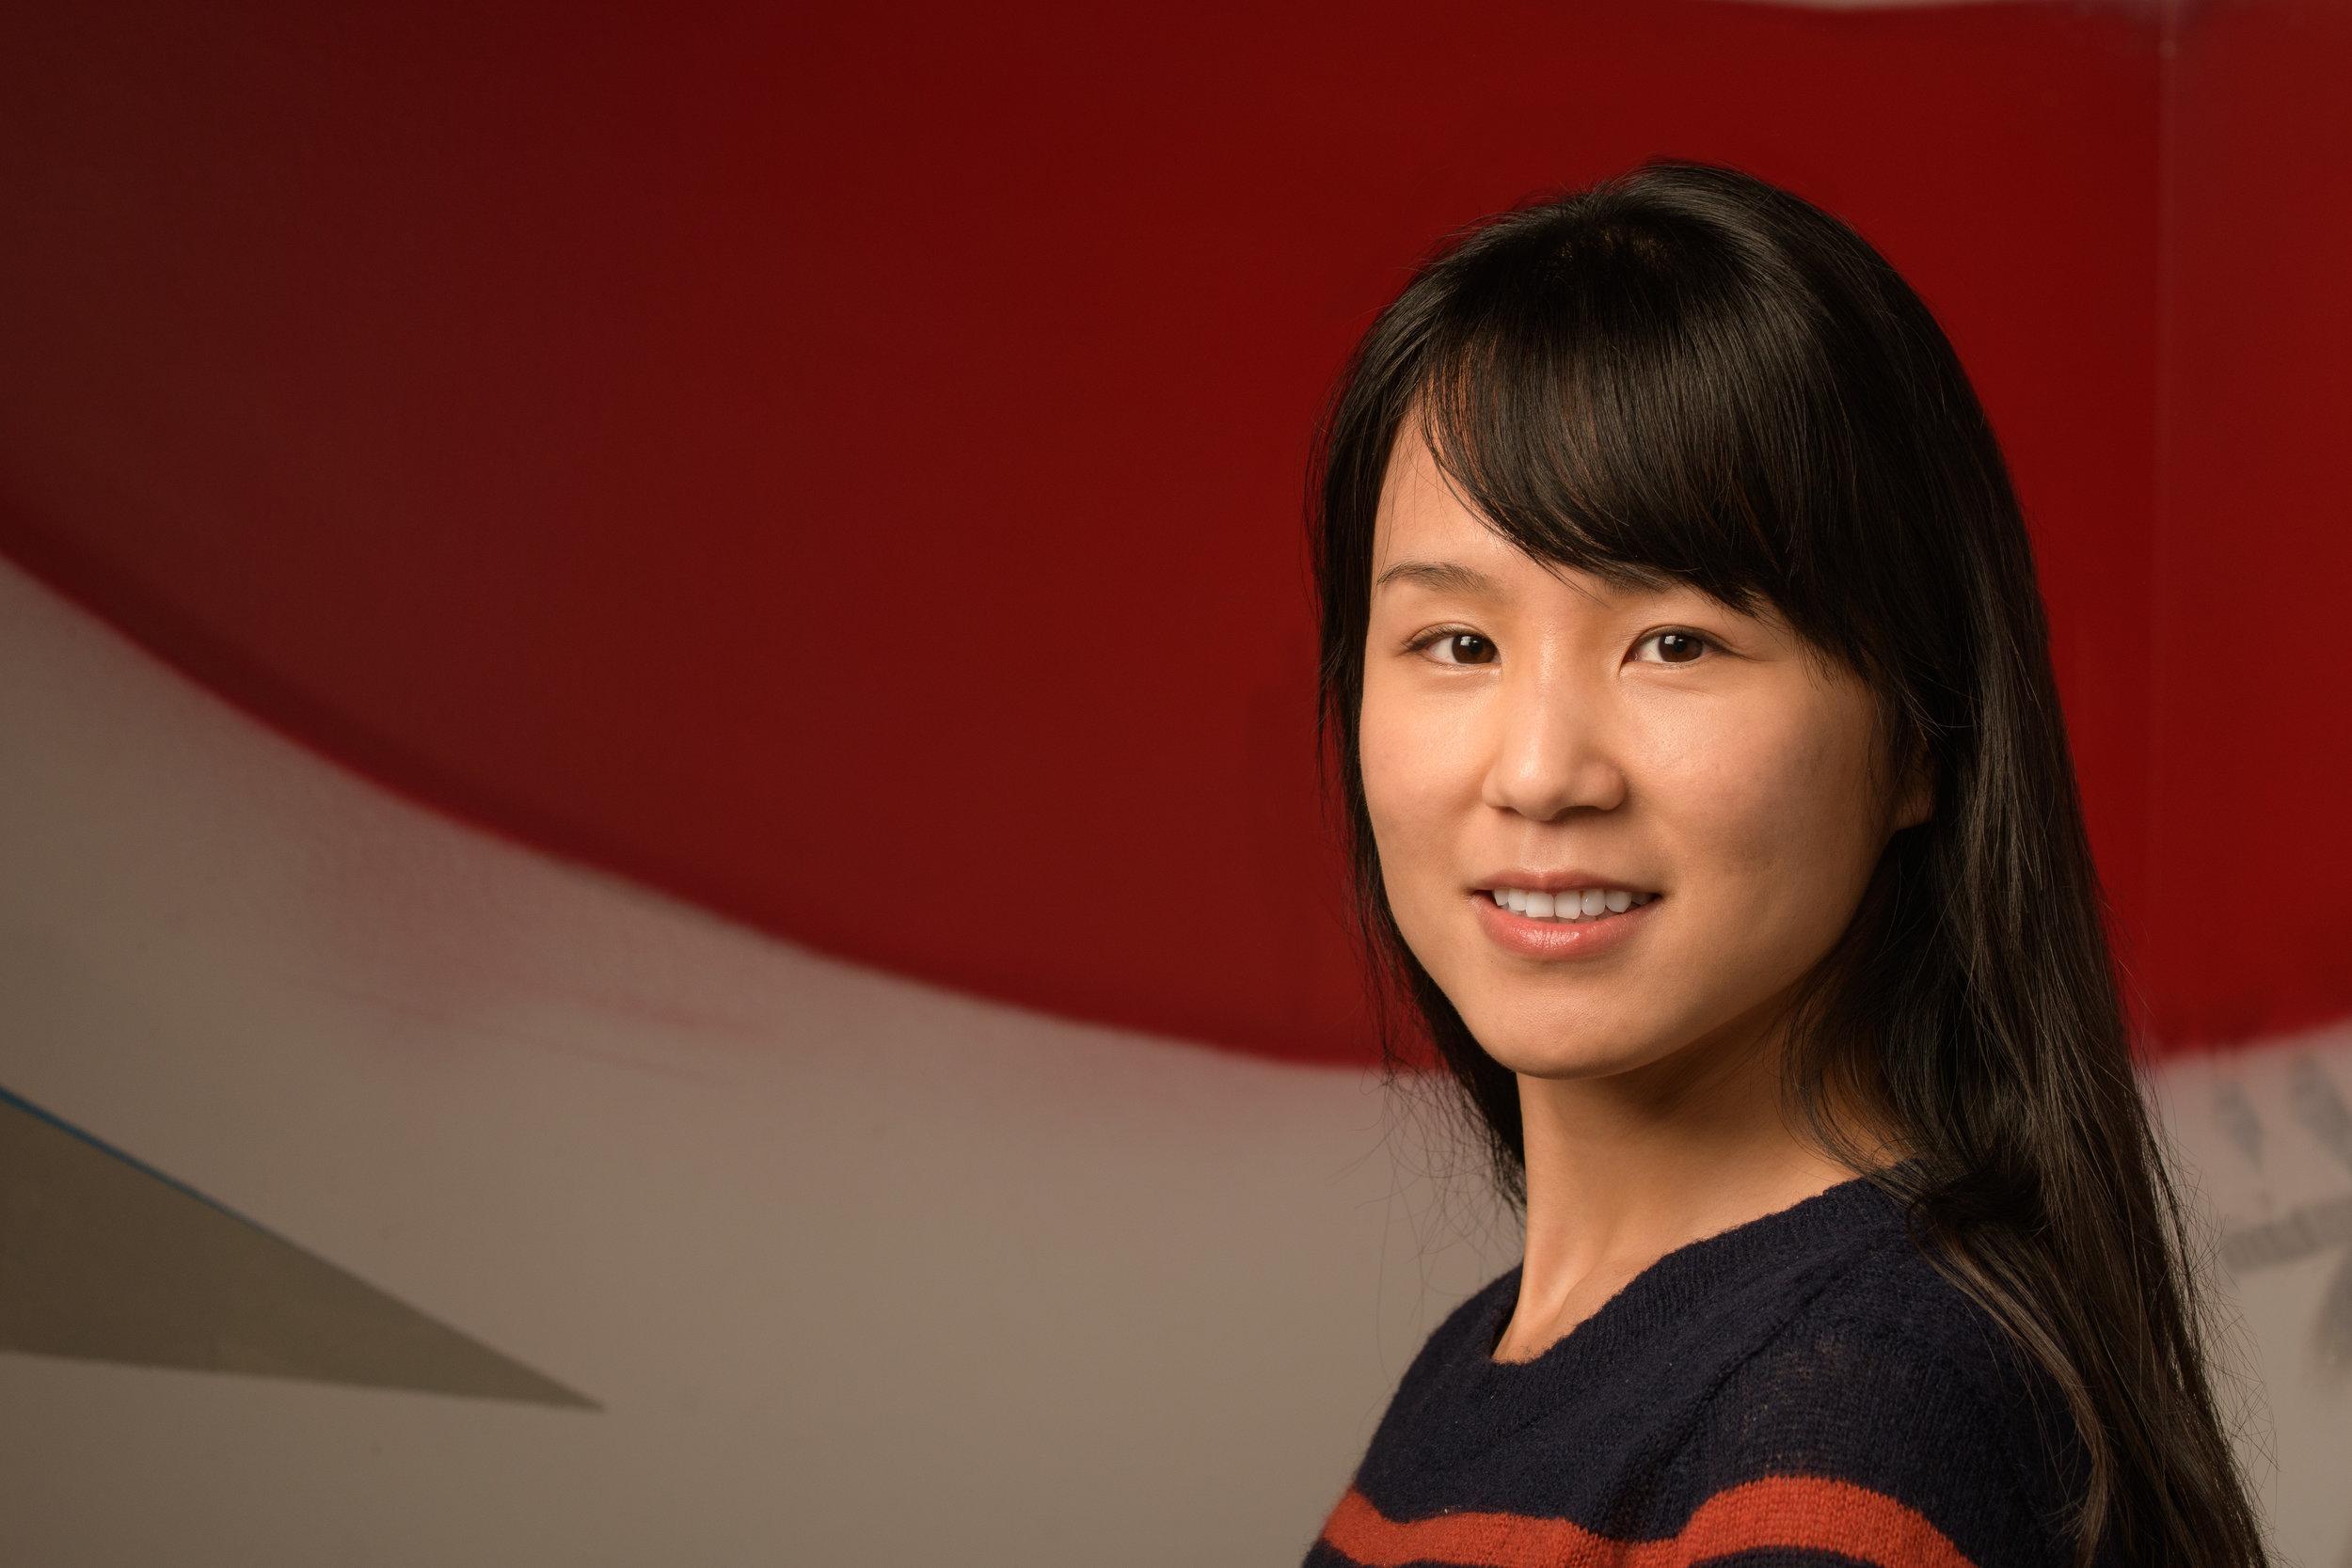 Portrait of JingJing Gu photographed in Reston, VA for Perfect Sense Digital.